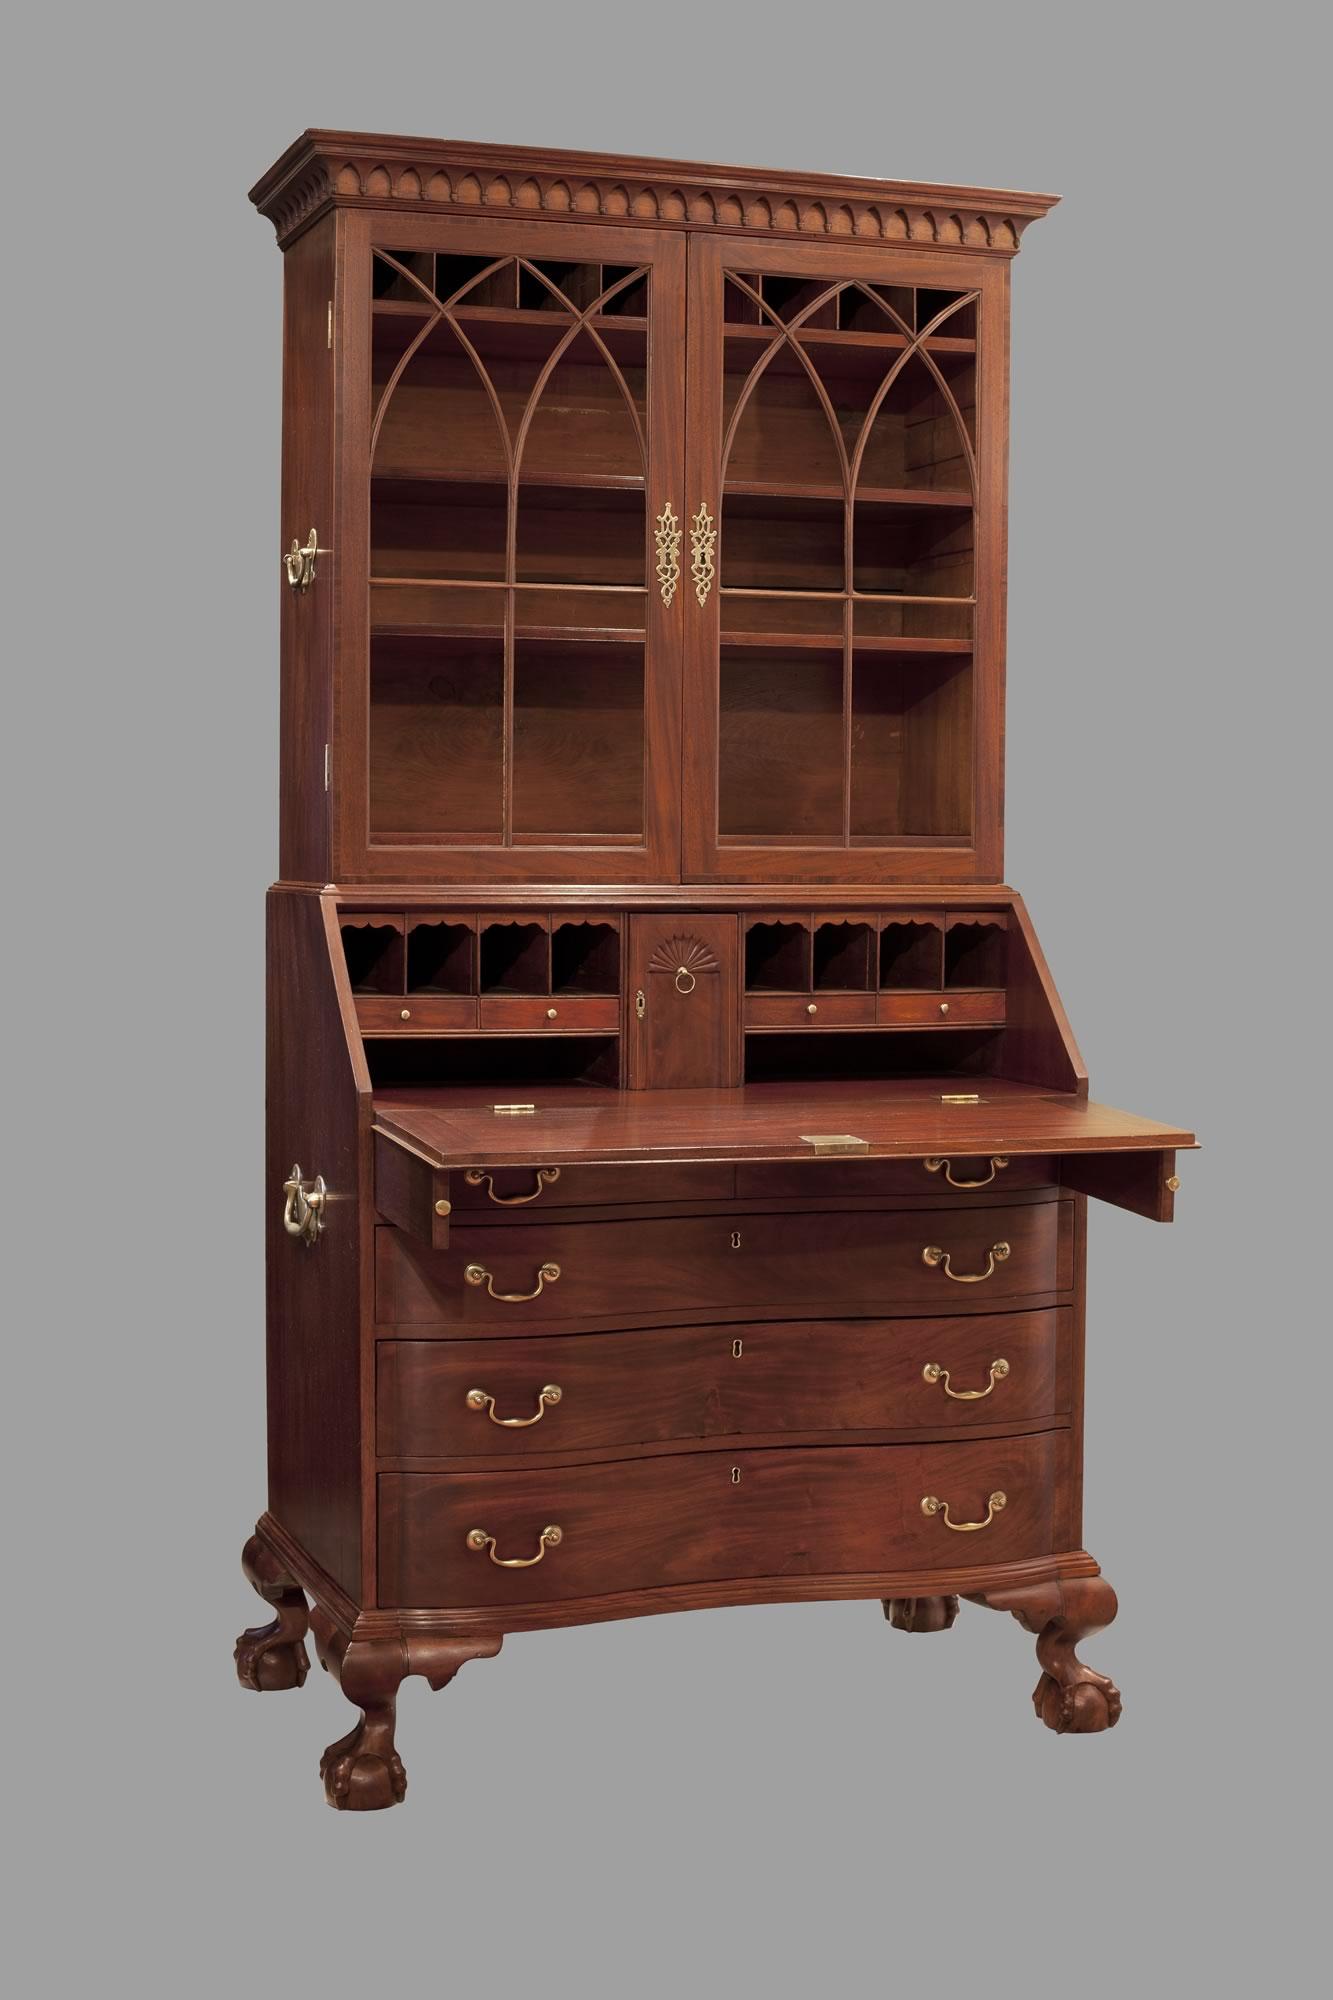 Click to view larger image - Boston, Chippendale Secretary Desk. Circa 1780 – 1790 · Gary Yeaton